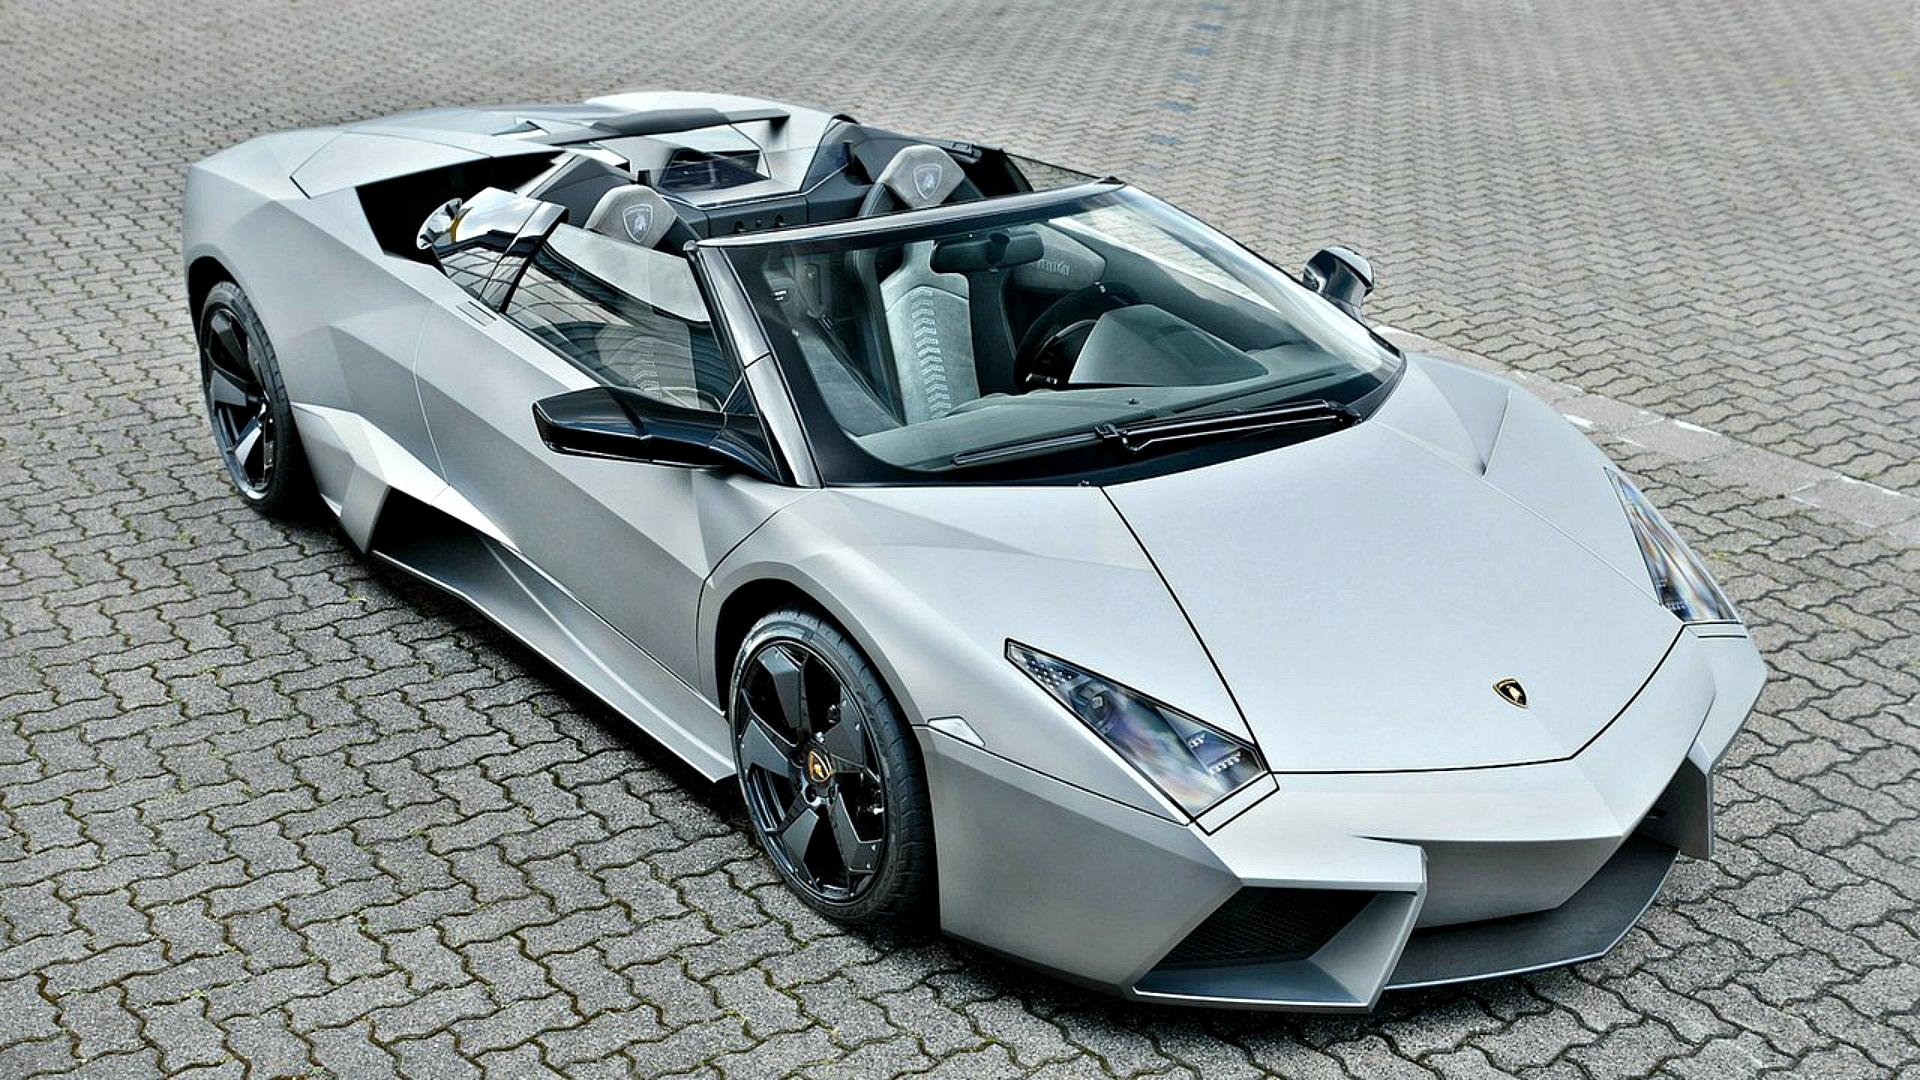 Wallpaper Lamborghini Aventador Side View Sports Car